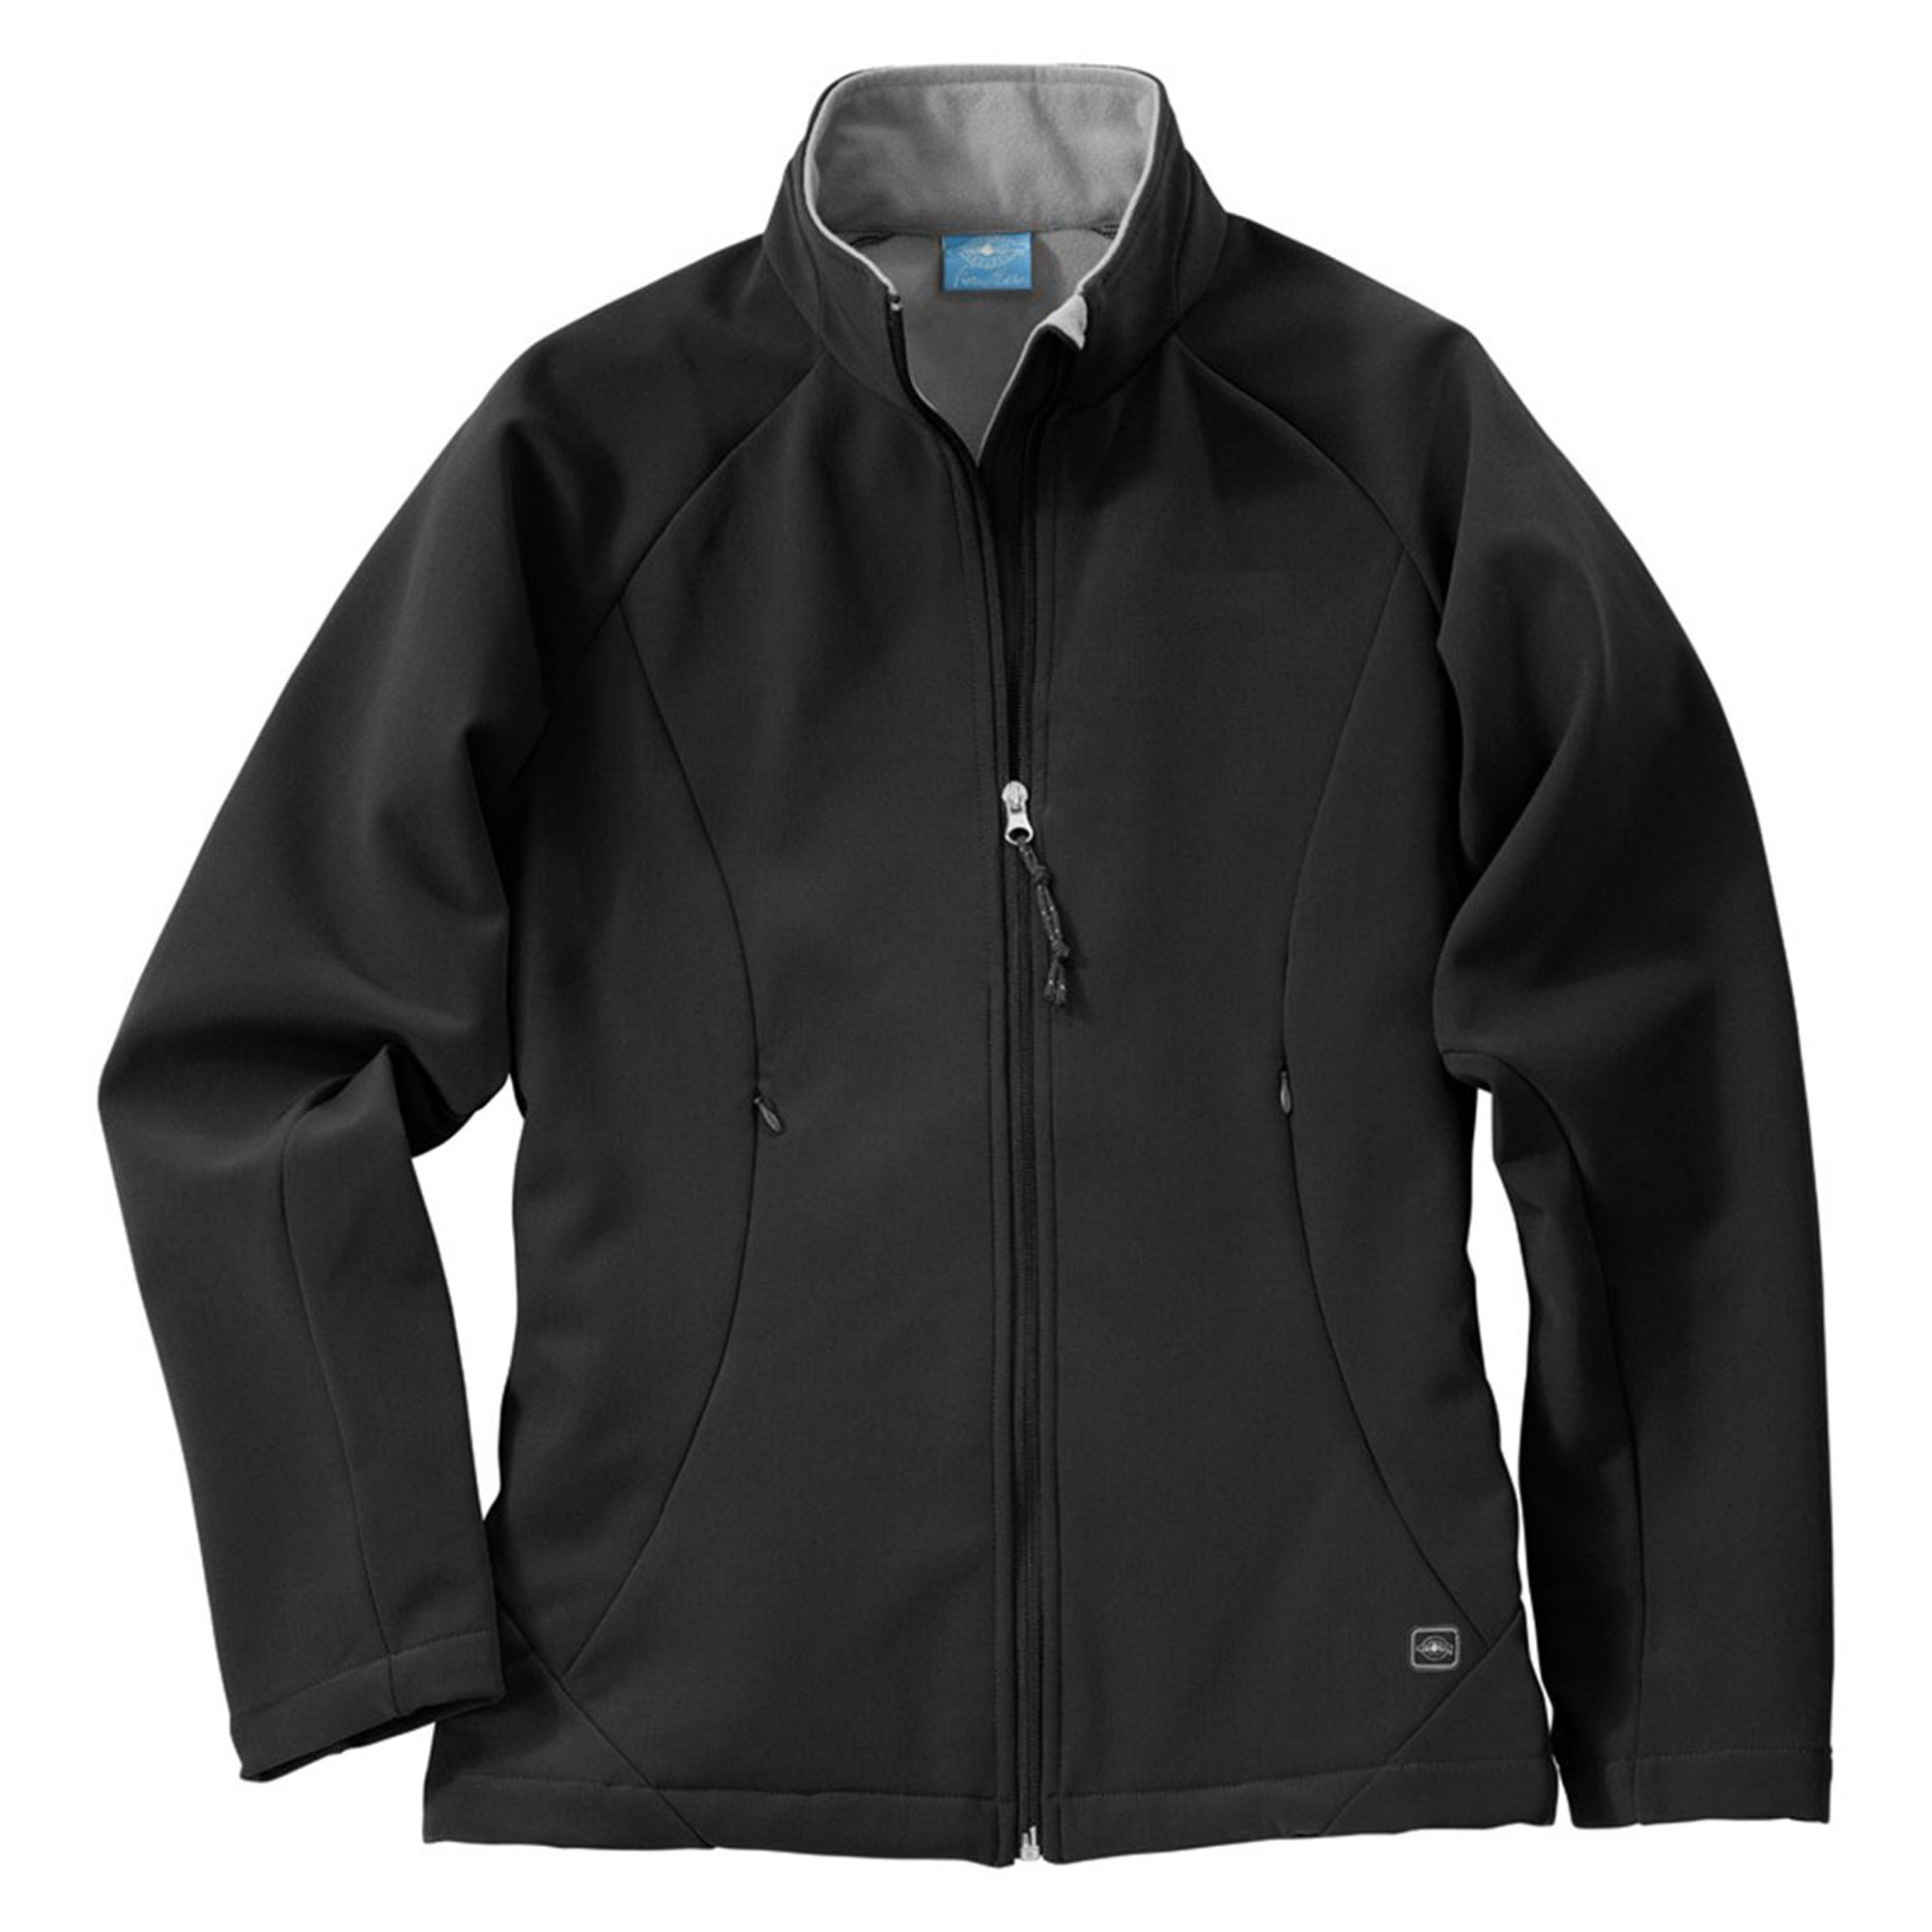 Charles River Apparel Women's Stylish Zipper Soft Shell Jacket